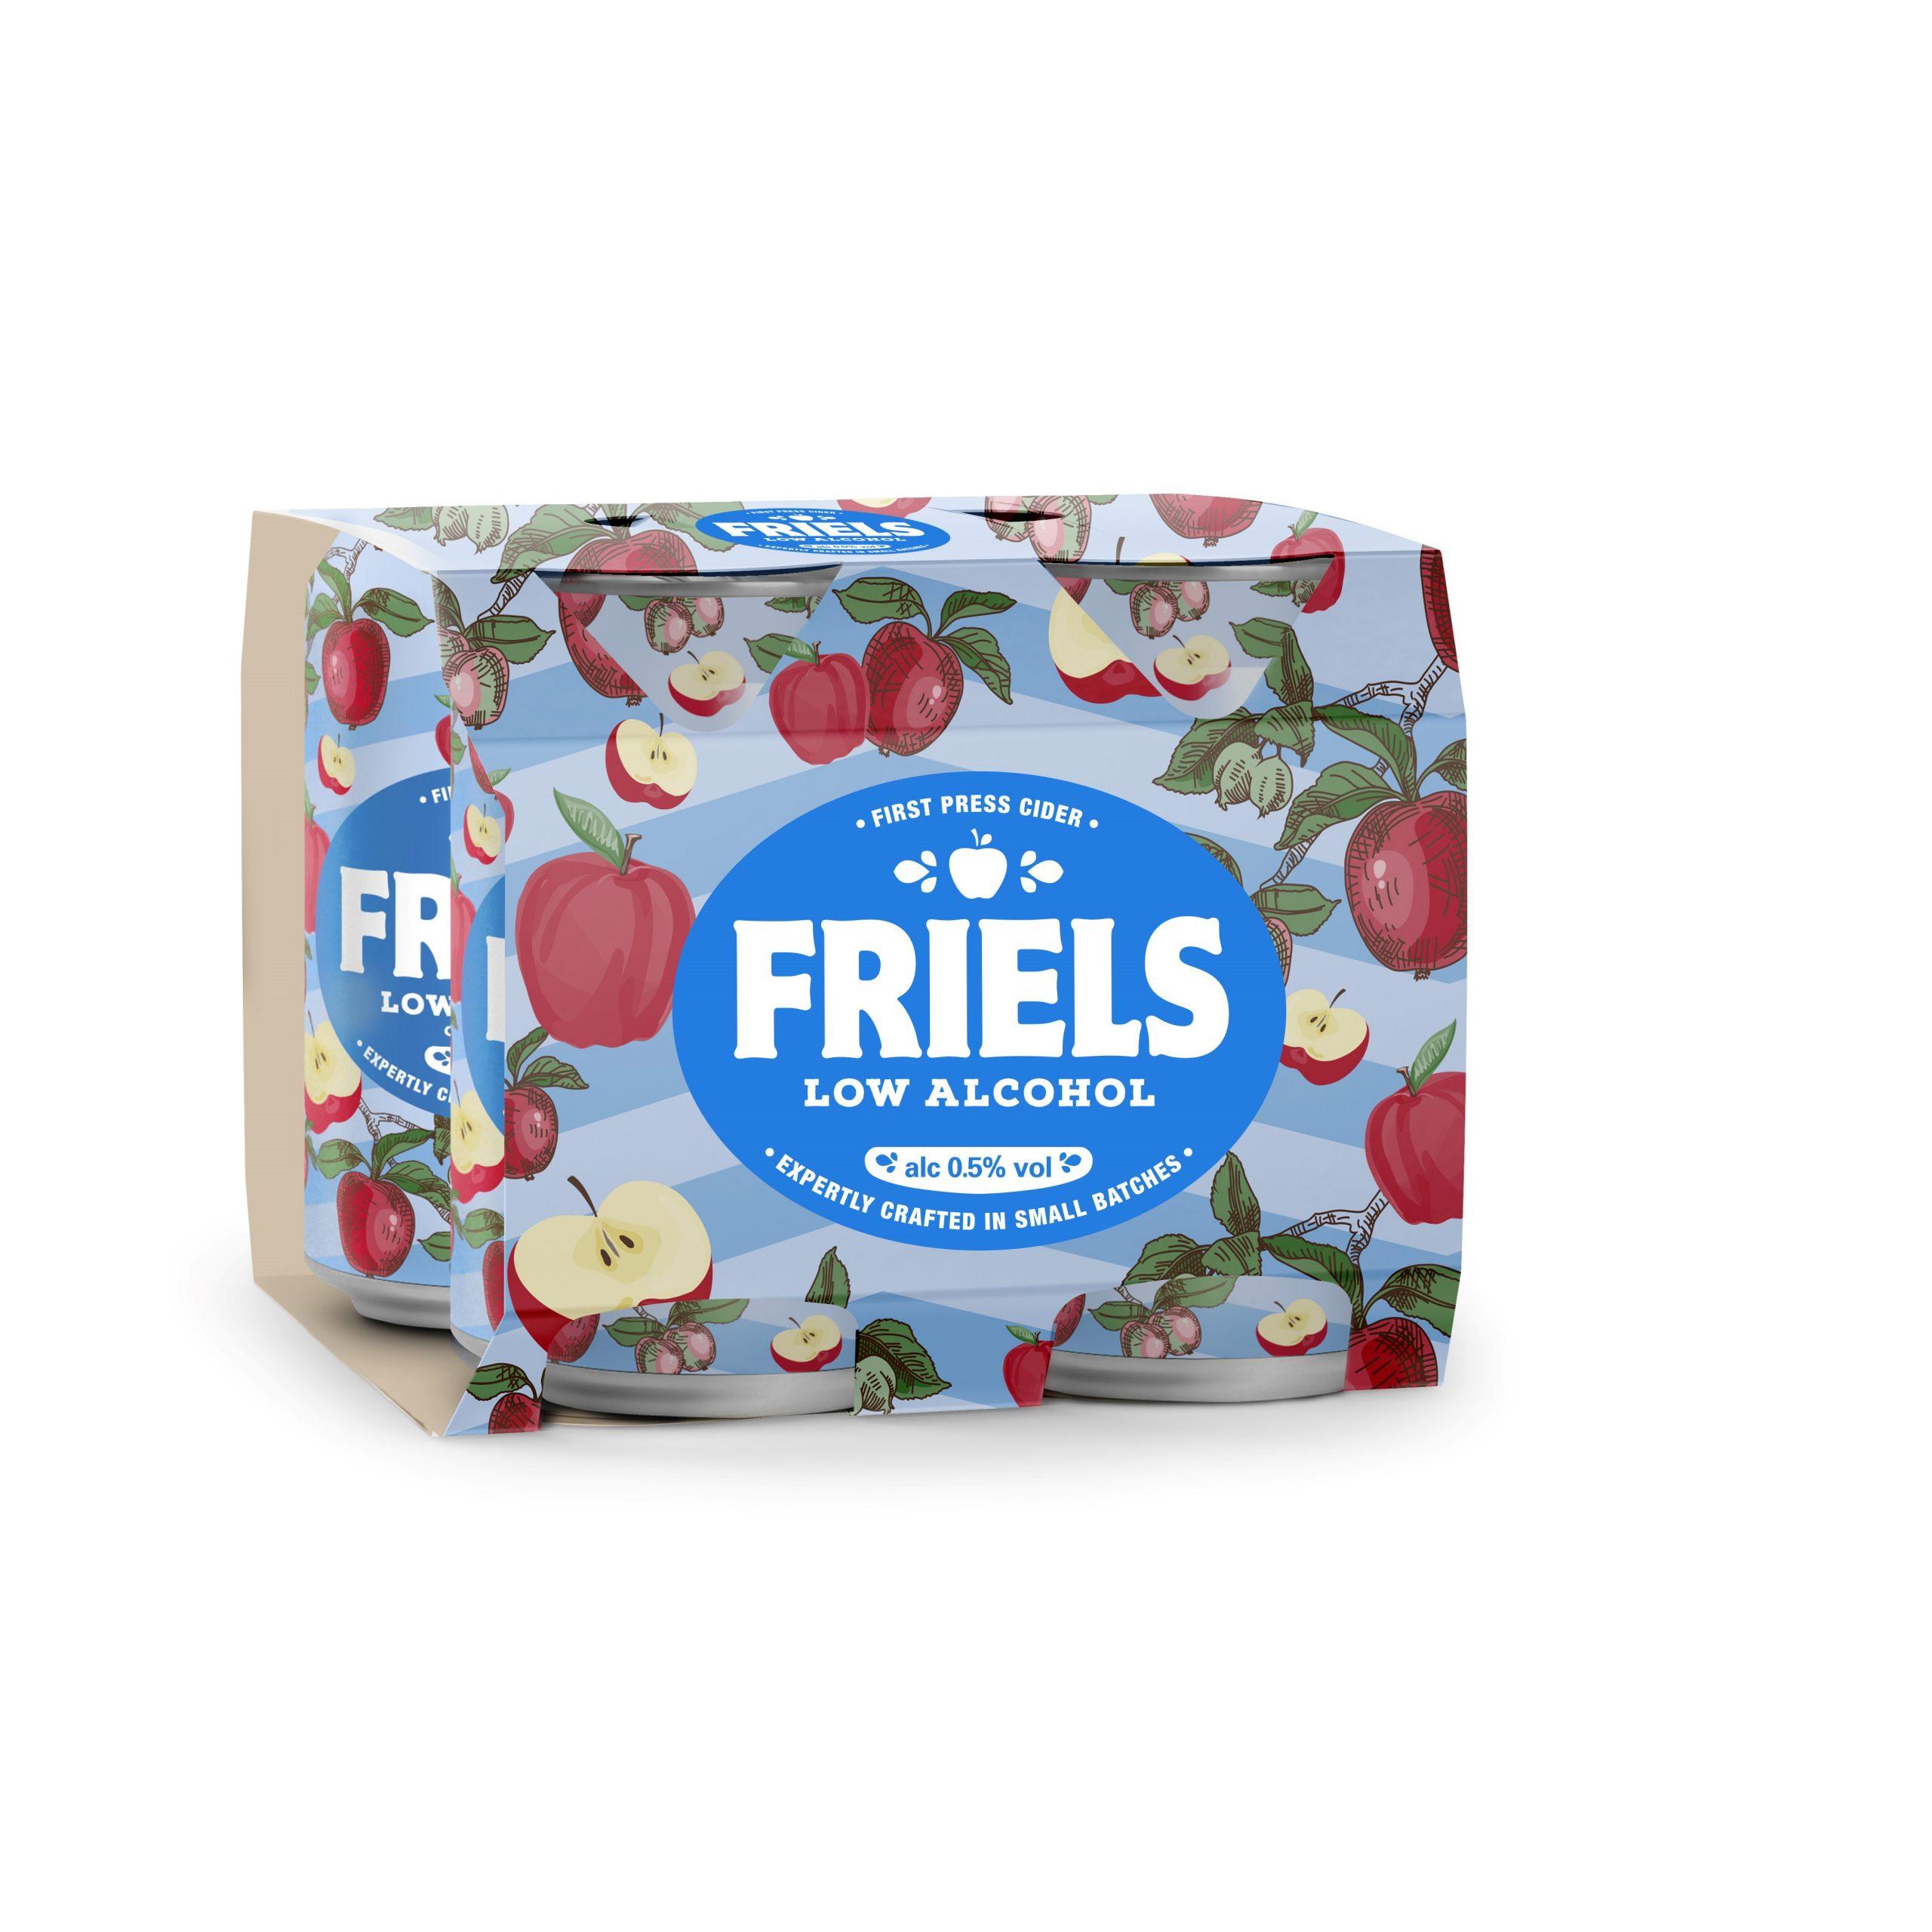 Friels Cider Launches Low Alcohol Premium Cider photo